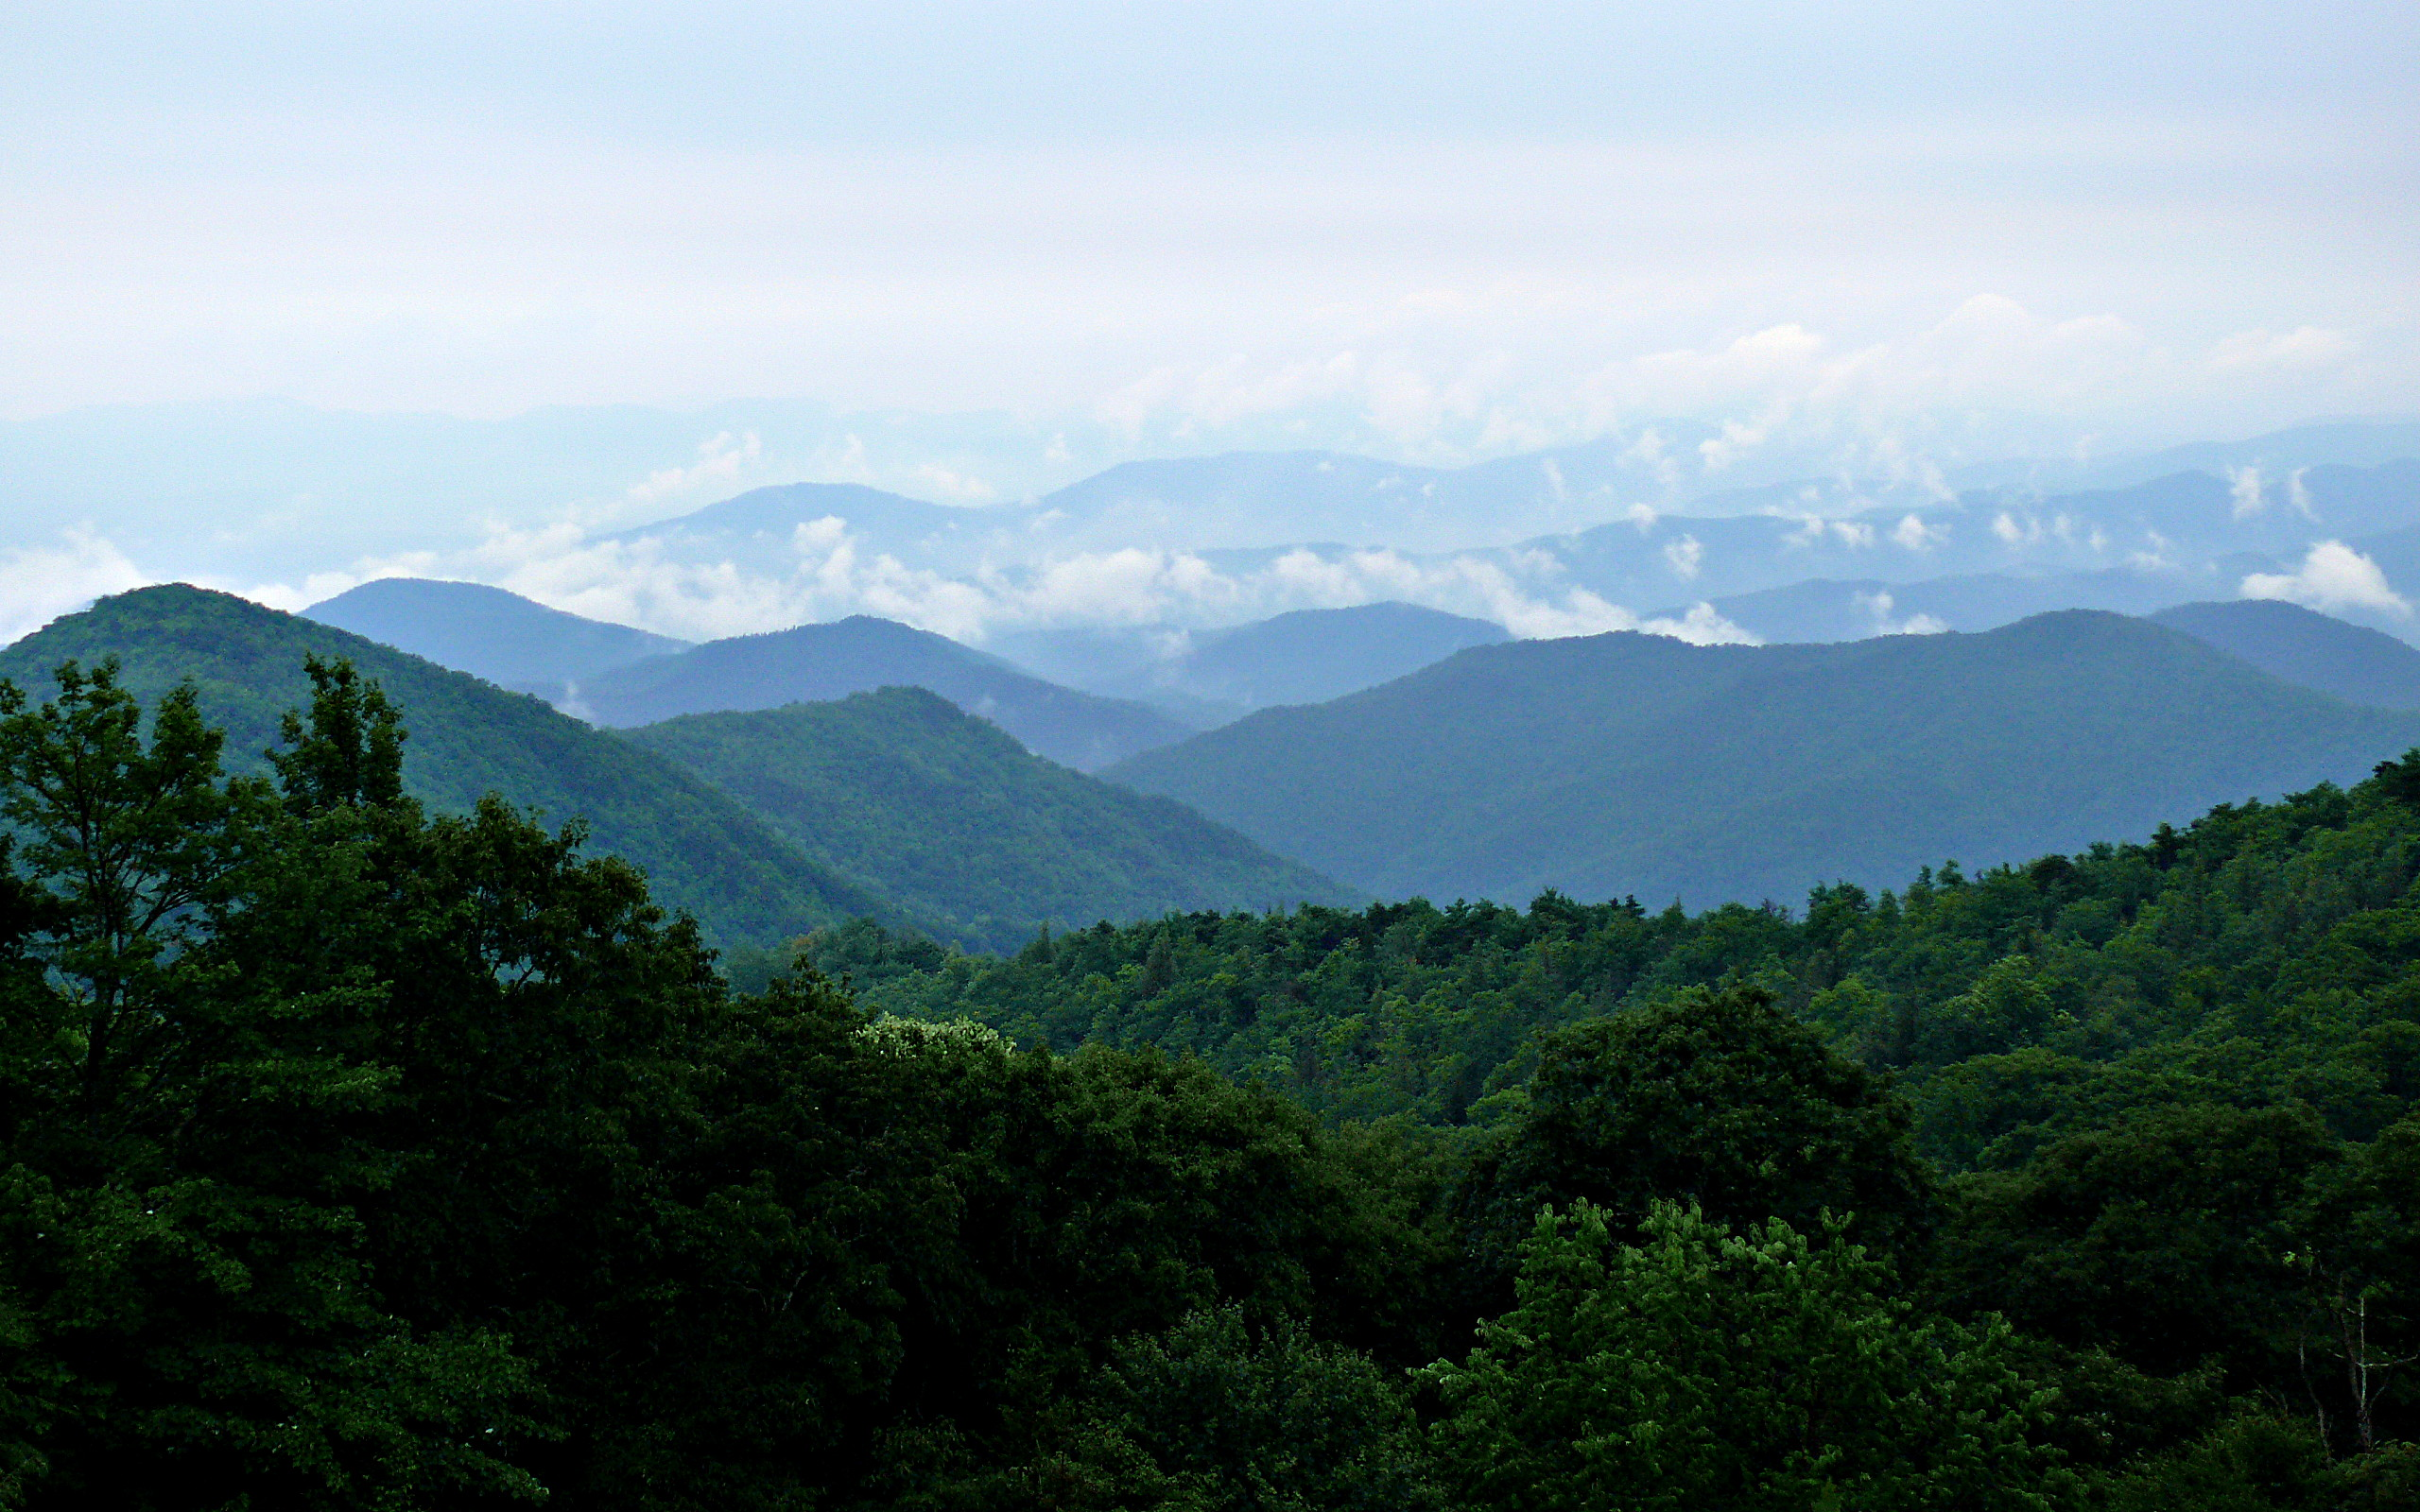 File:Rainy Blue Ridge-27527.jpg - Wikimedia Commons